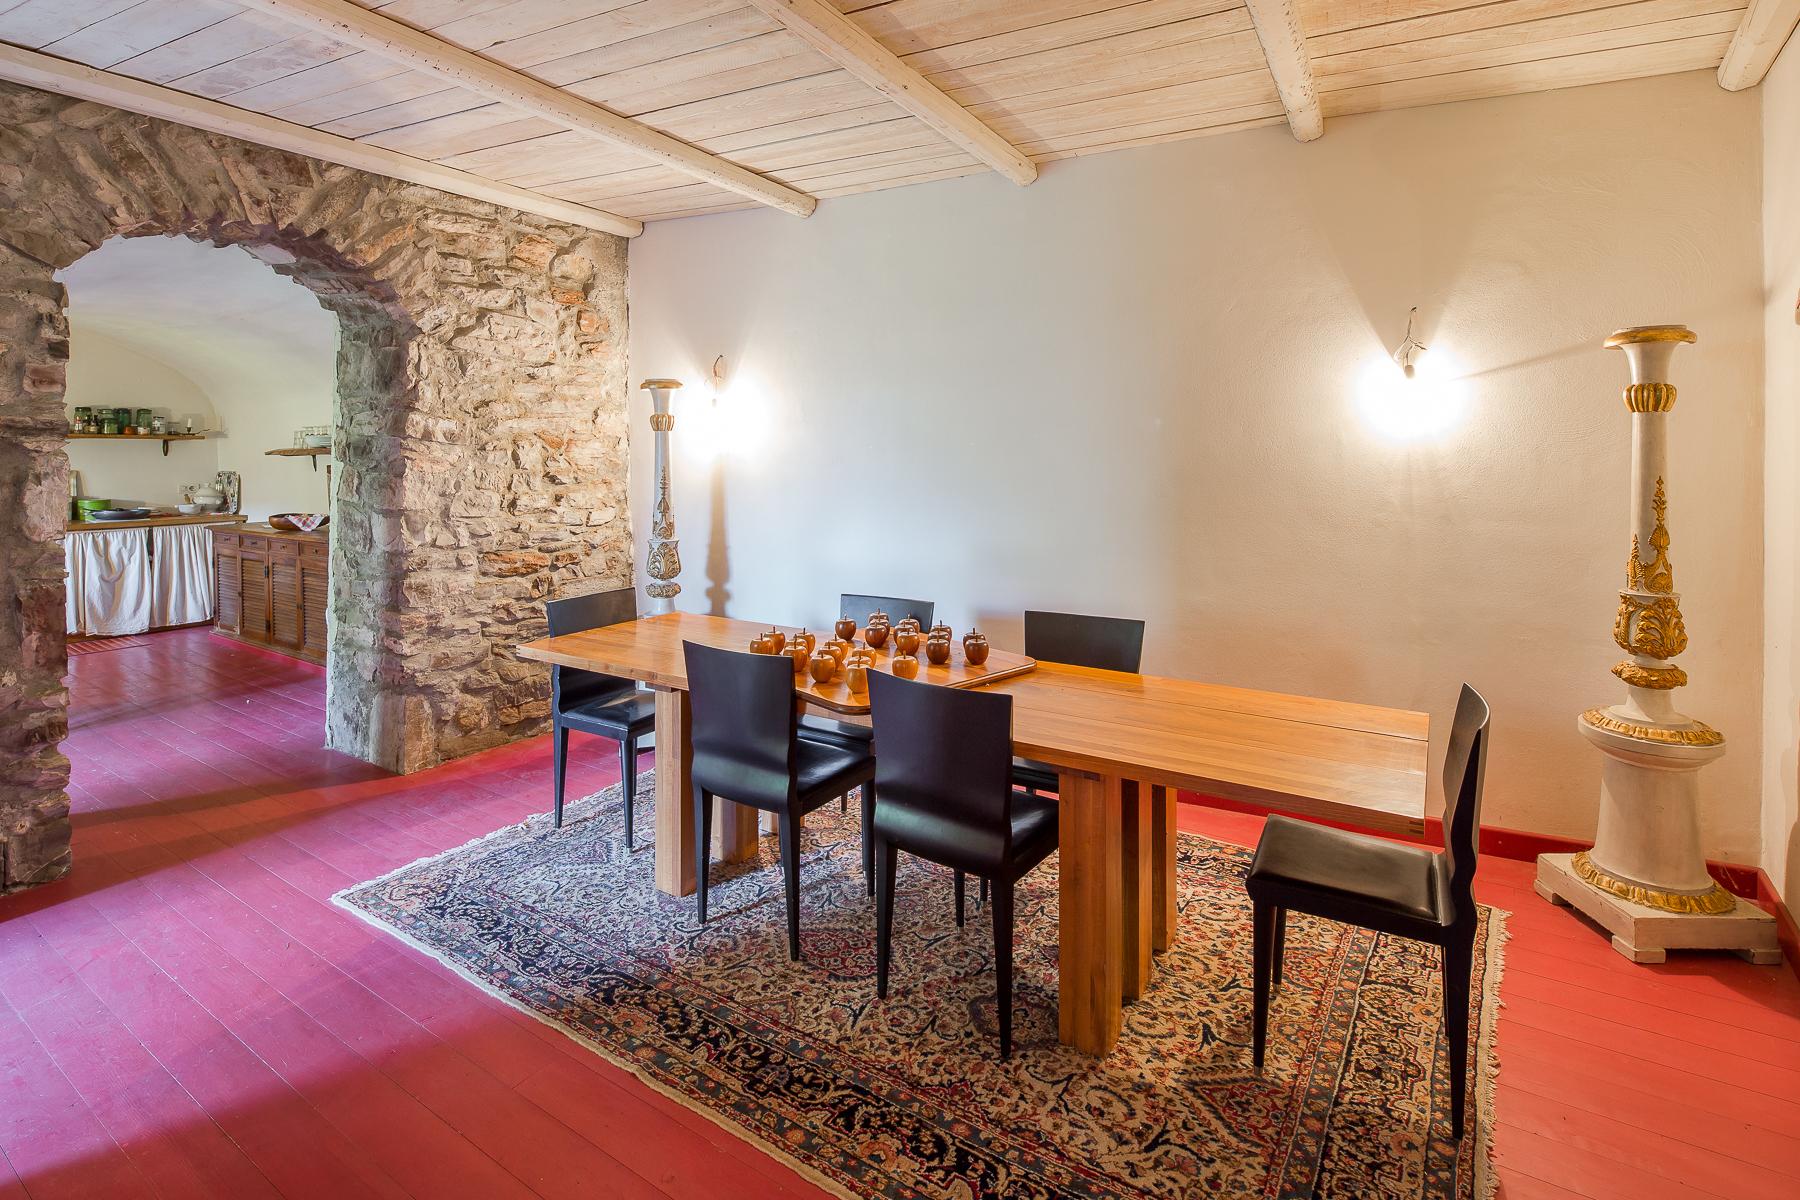 Casa indipendente in Vendita a Caprino Bergamasco: 5 locali, 500 mq - Foto 6